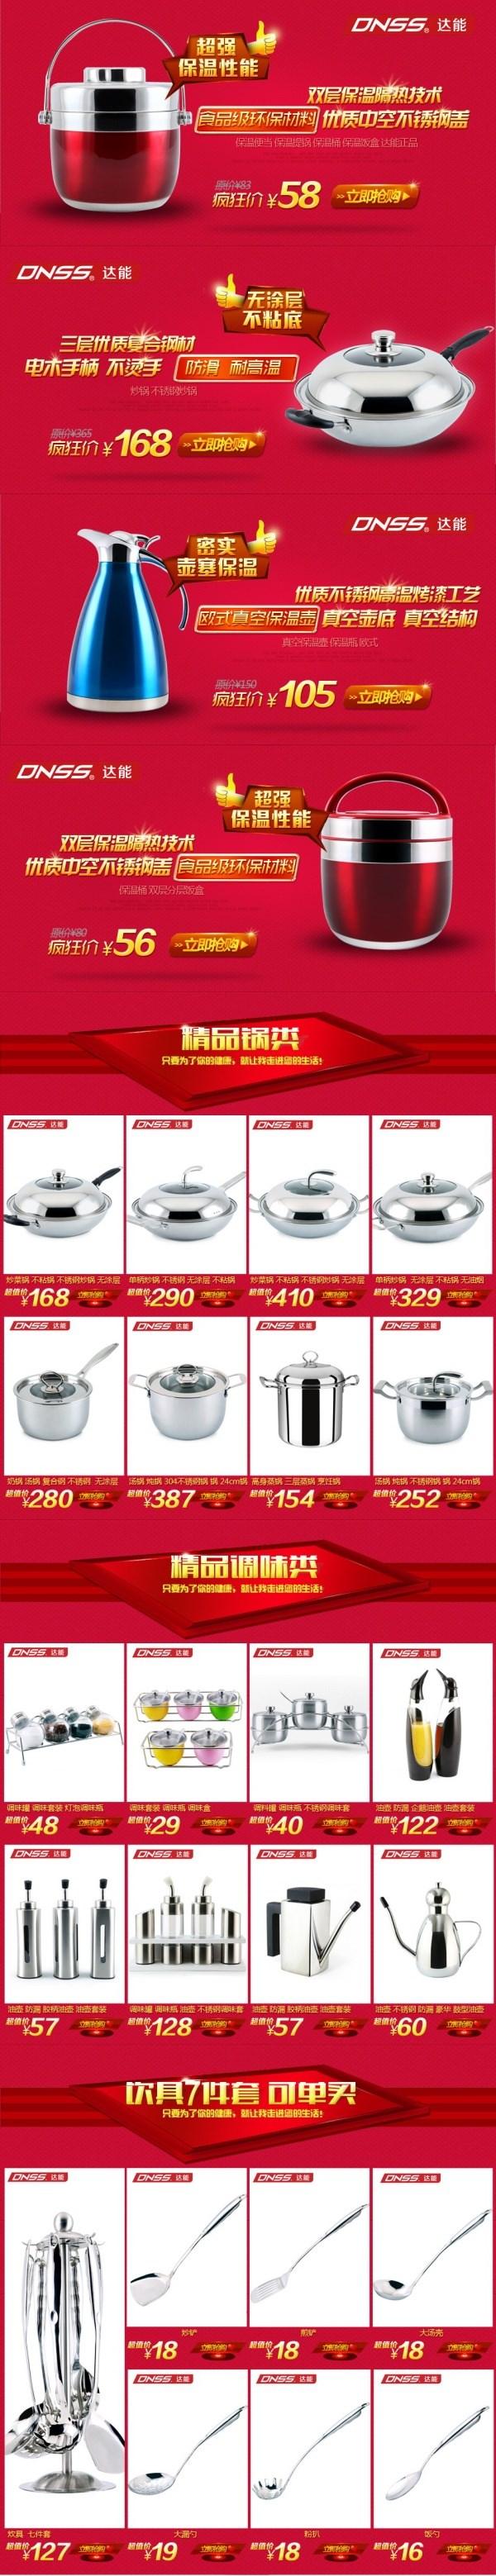 Taobao kitchenware promo PSD free